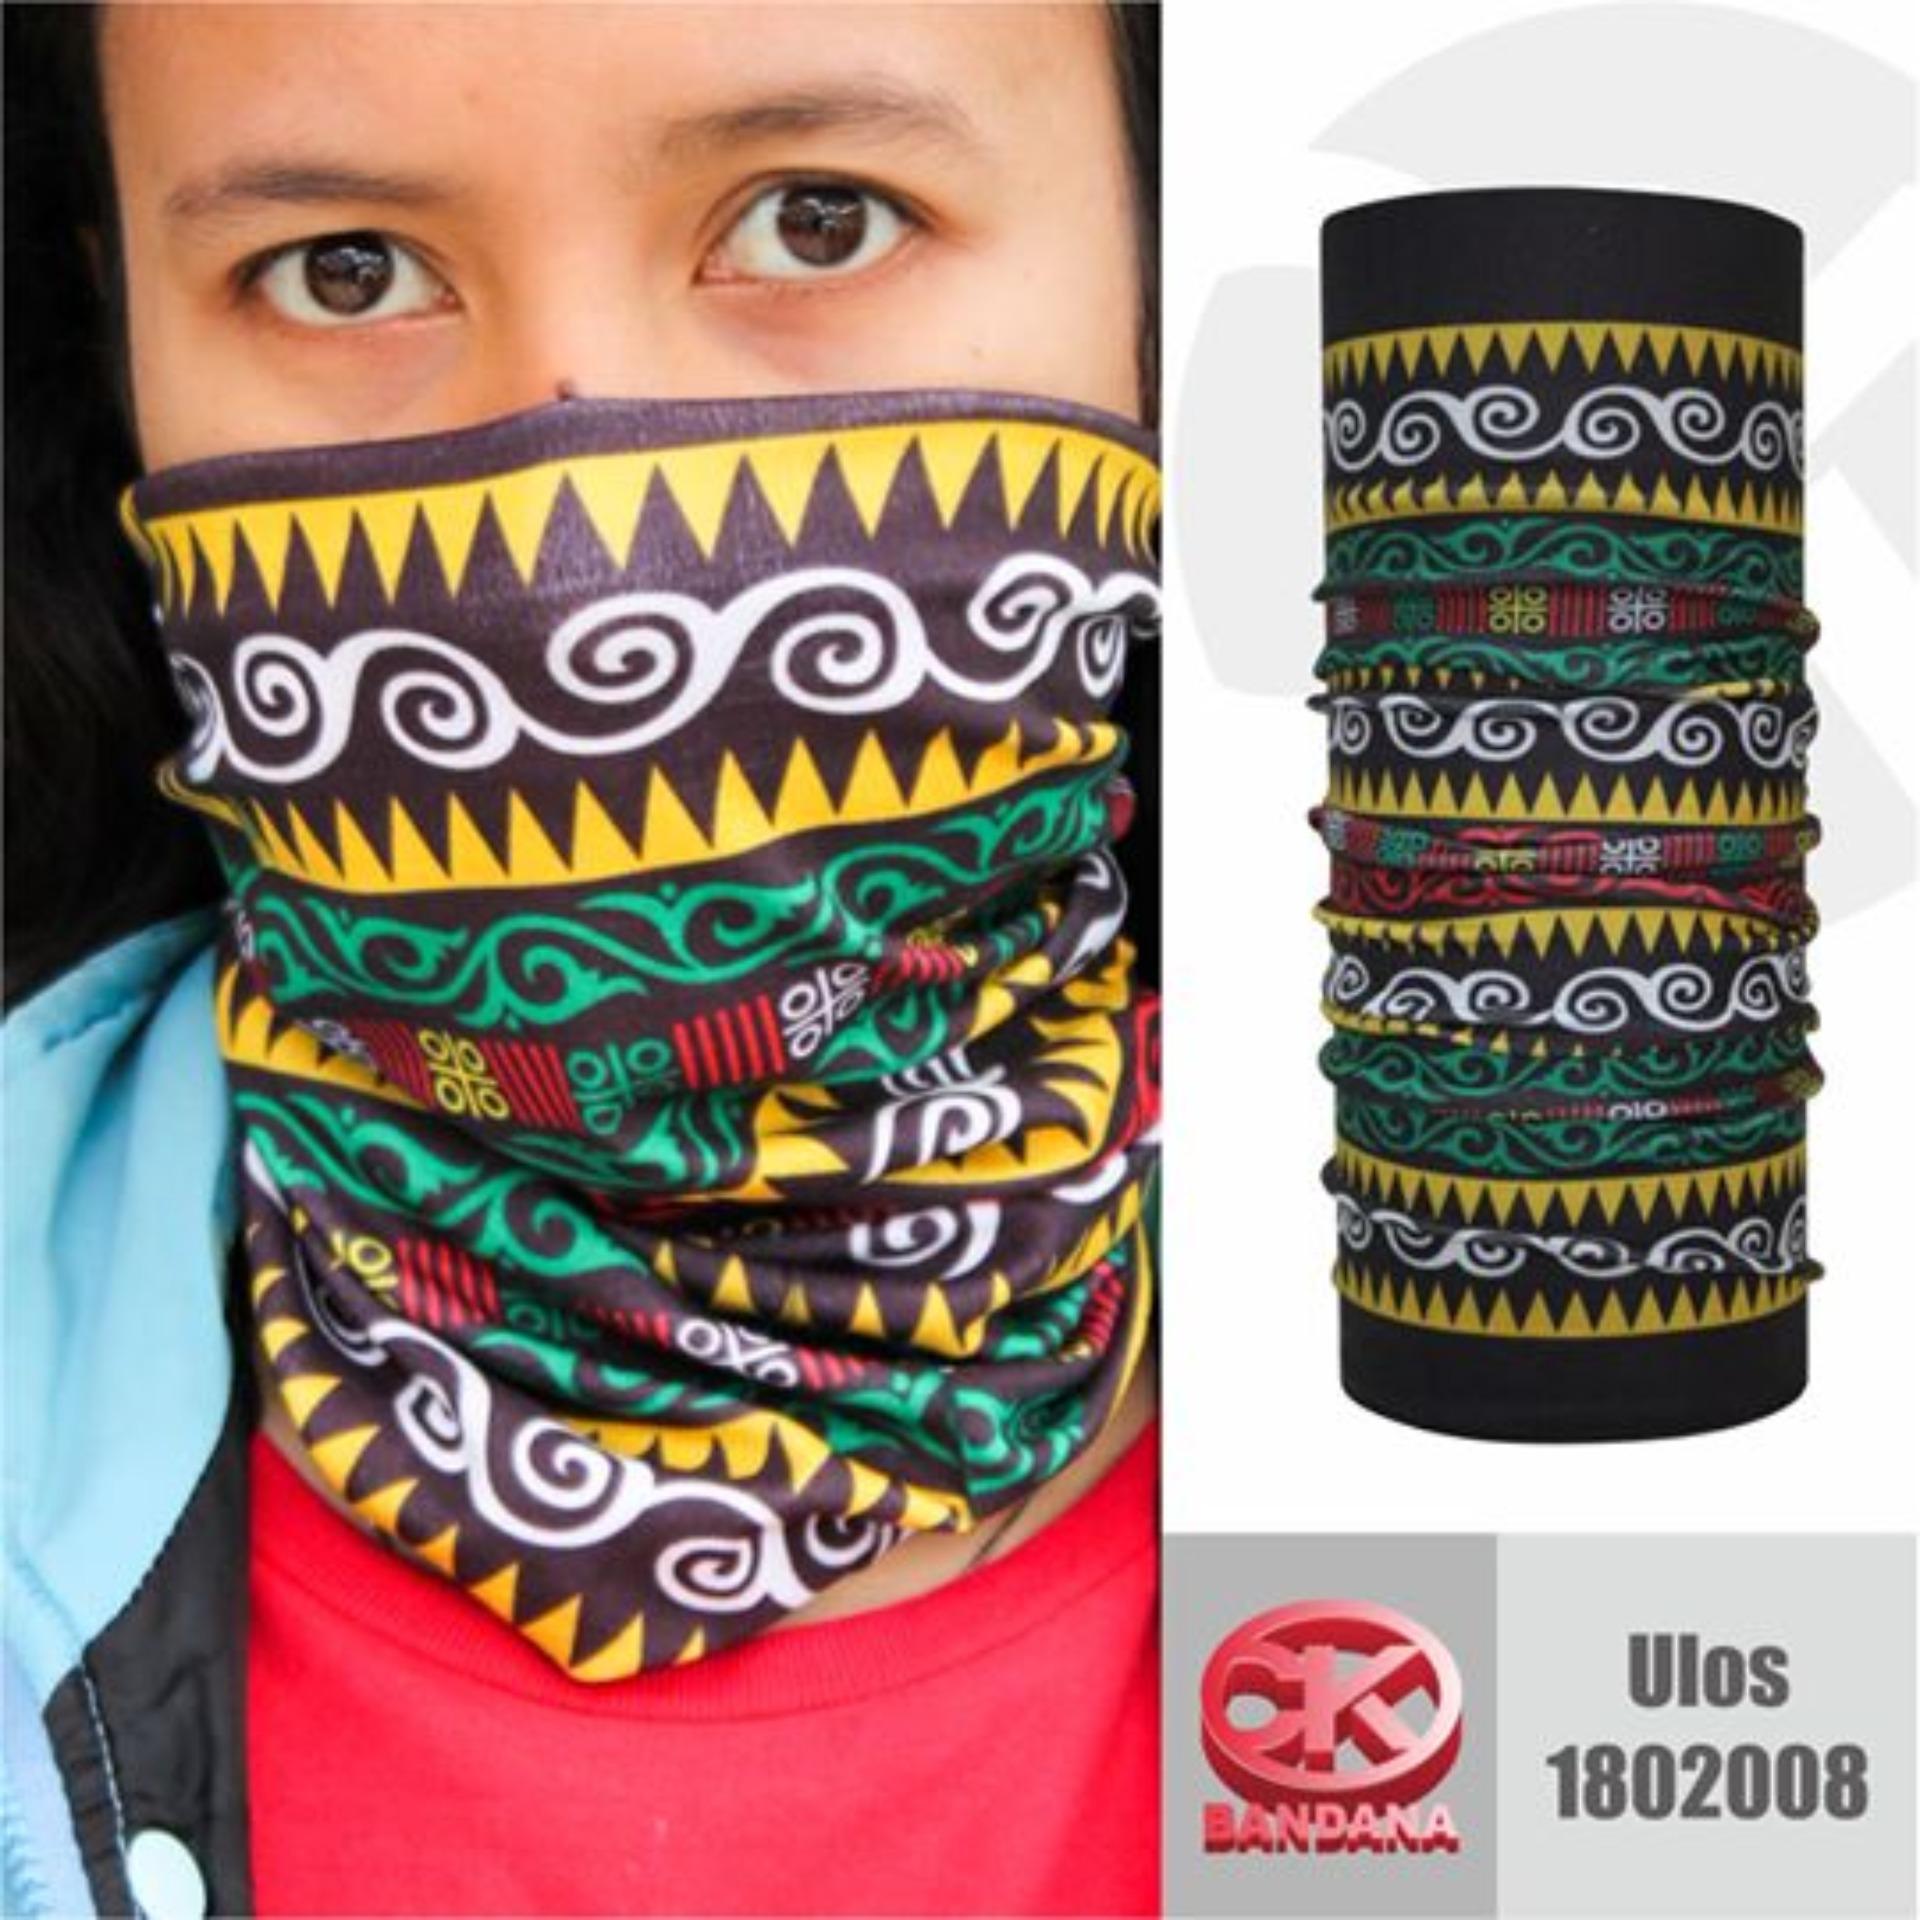 Buff CK Bandana 1802008 Masker Multifungsi Motif Ulos